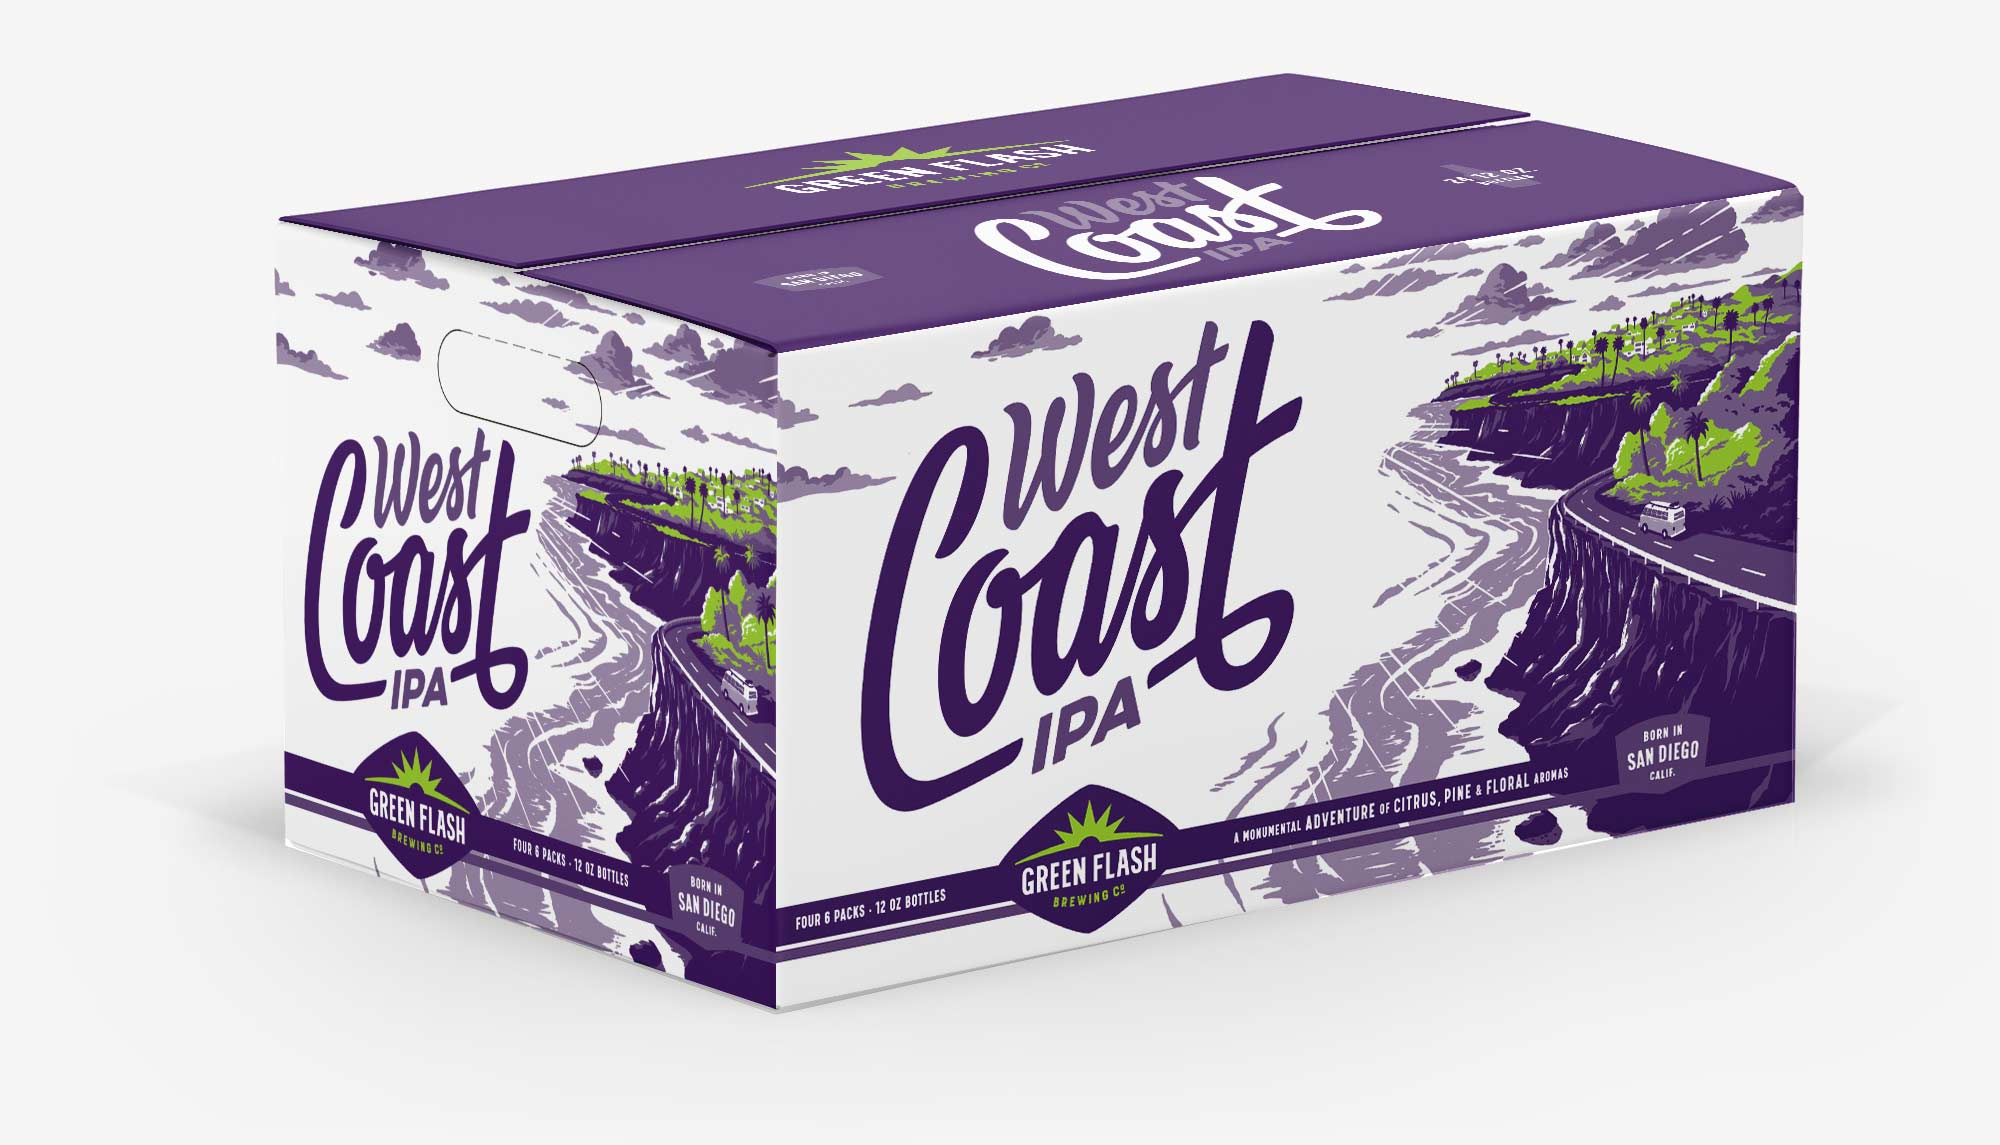 Mother carton case box design for Green Flash West Coast IPA